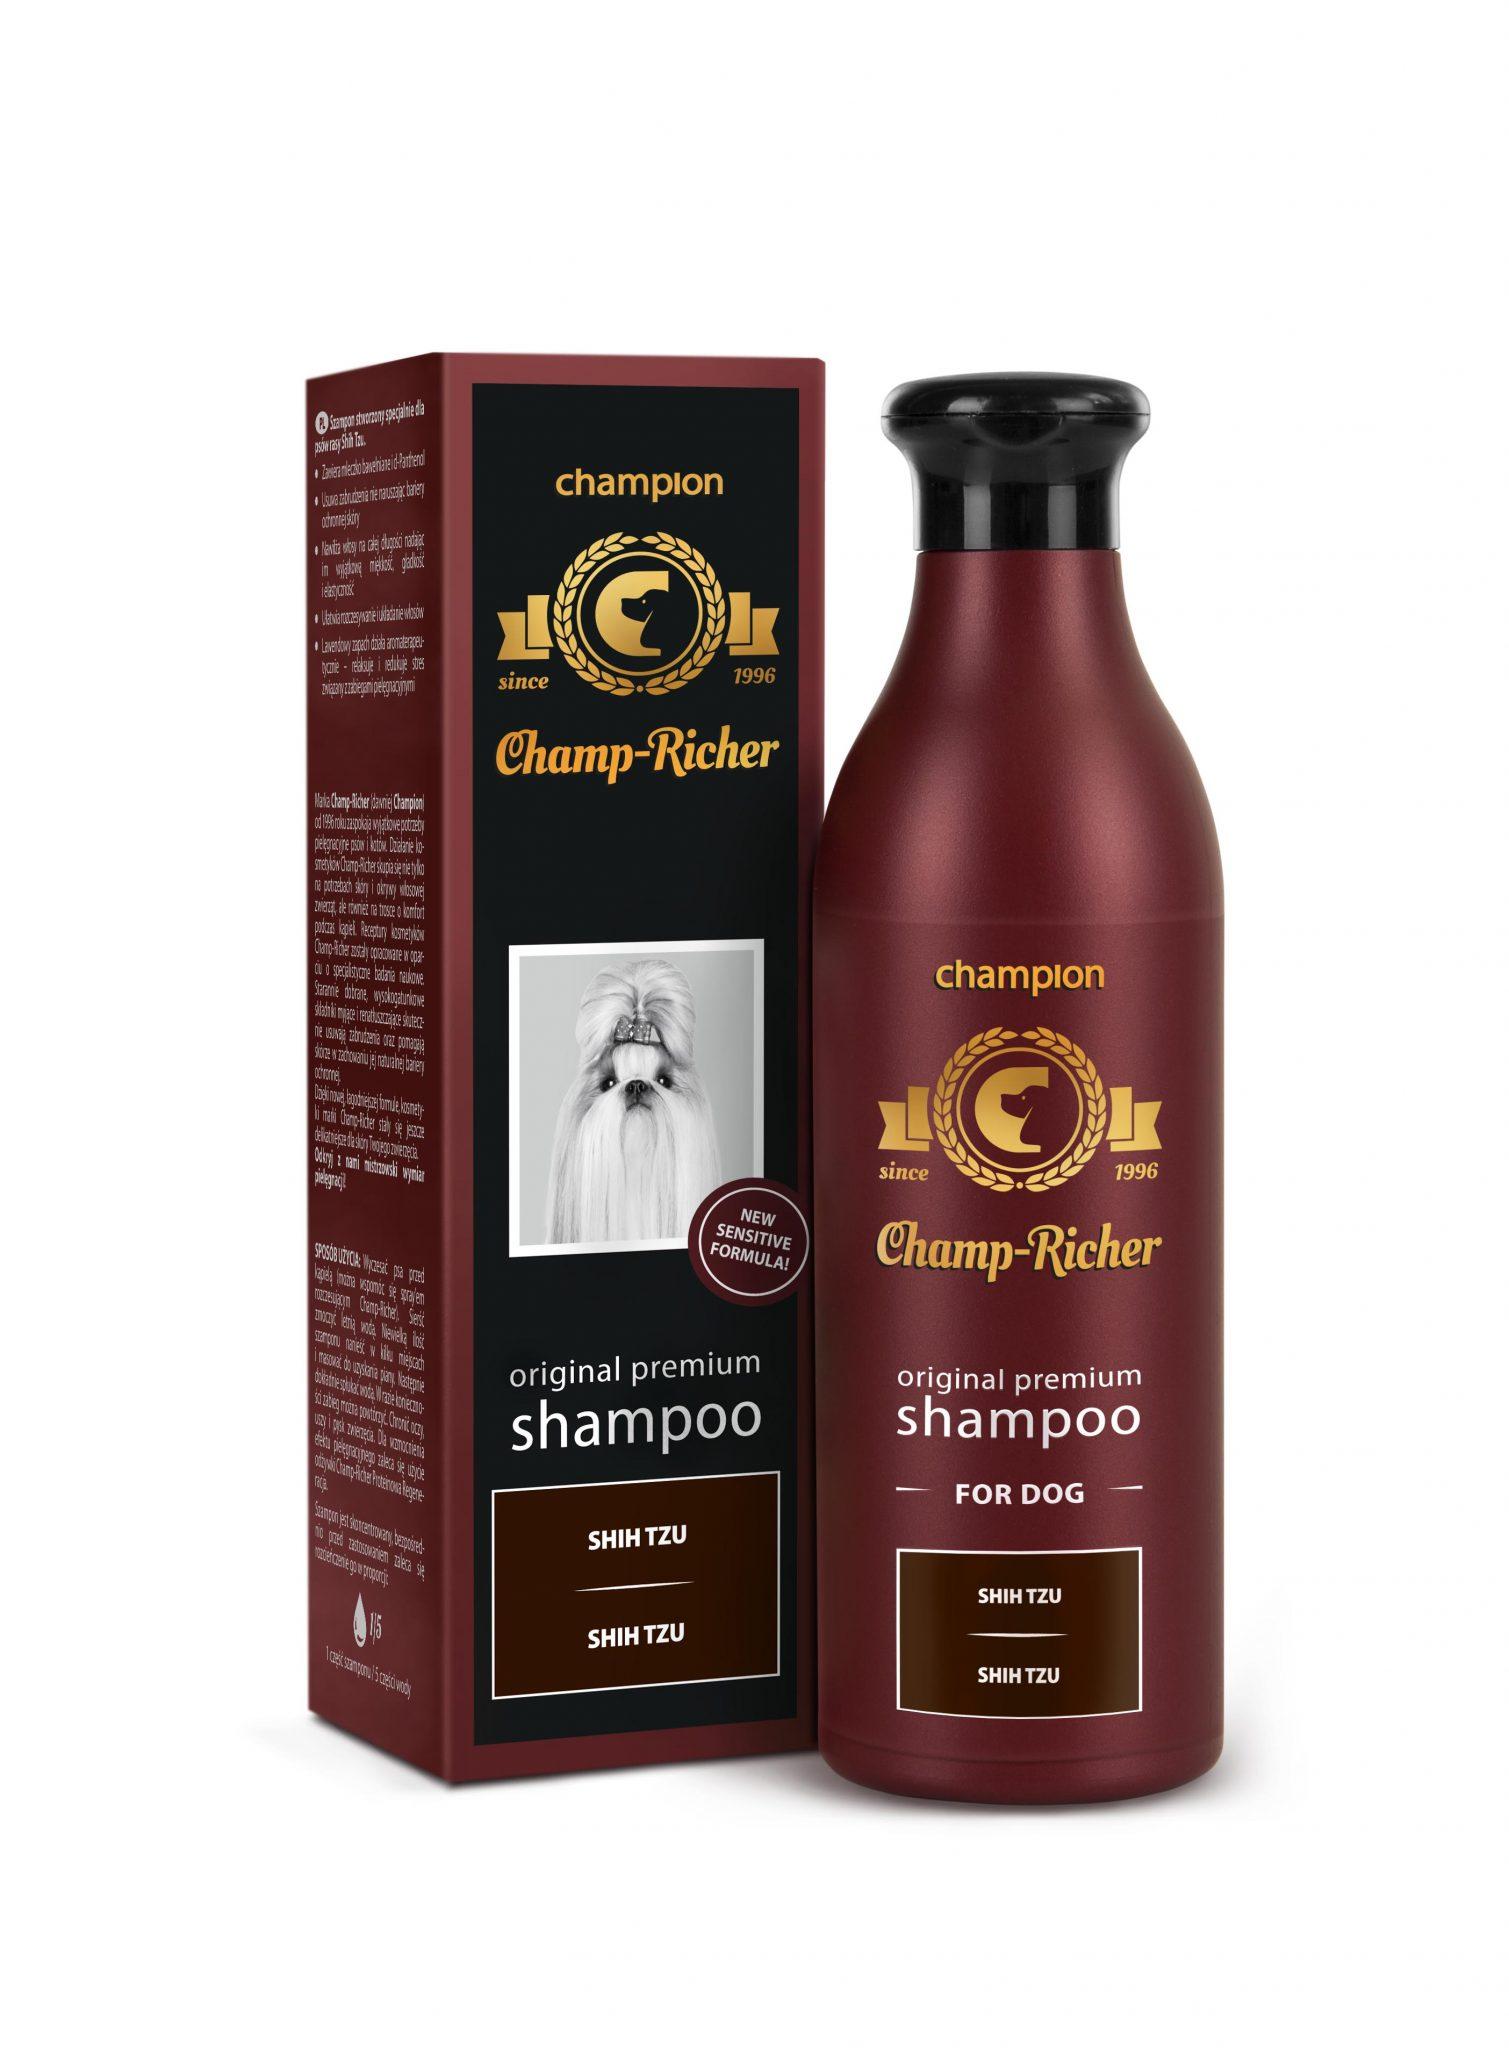 Champ-Richer szampon Shih Tzu